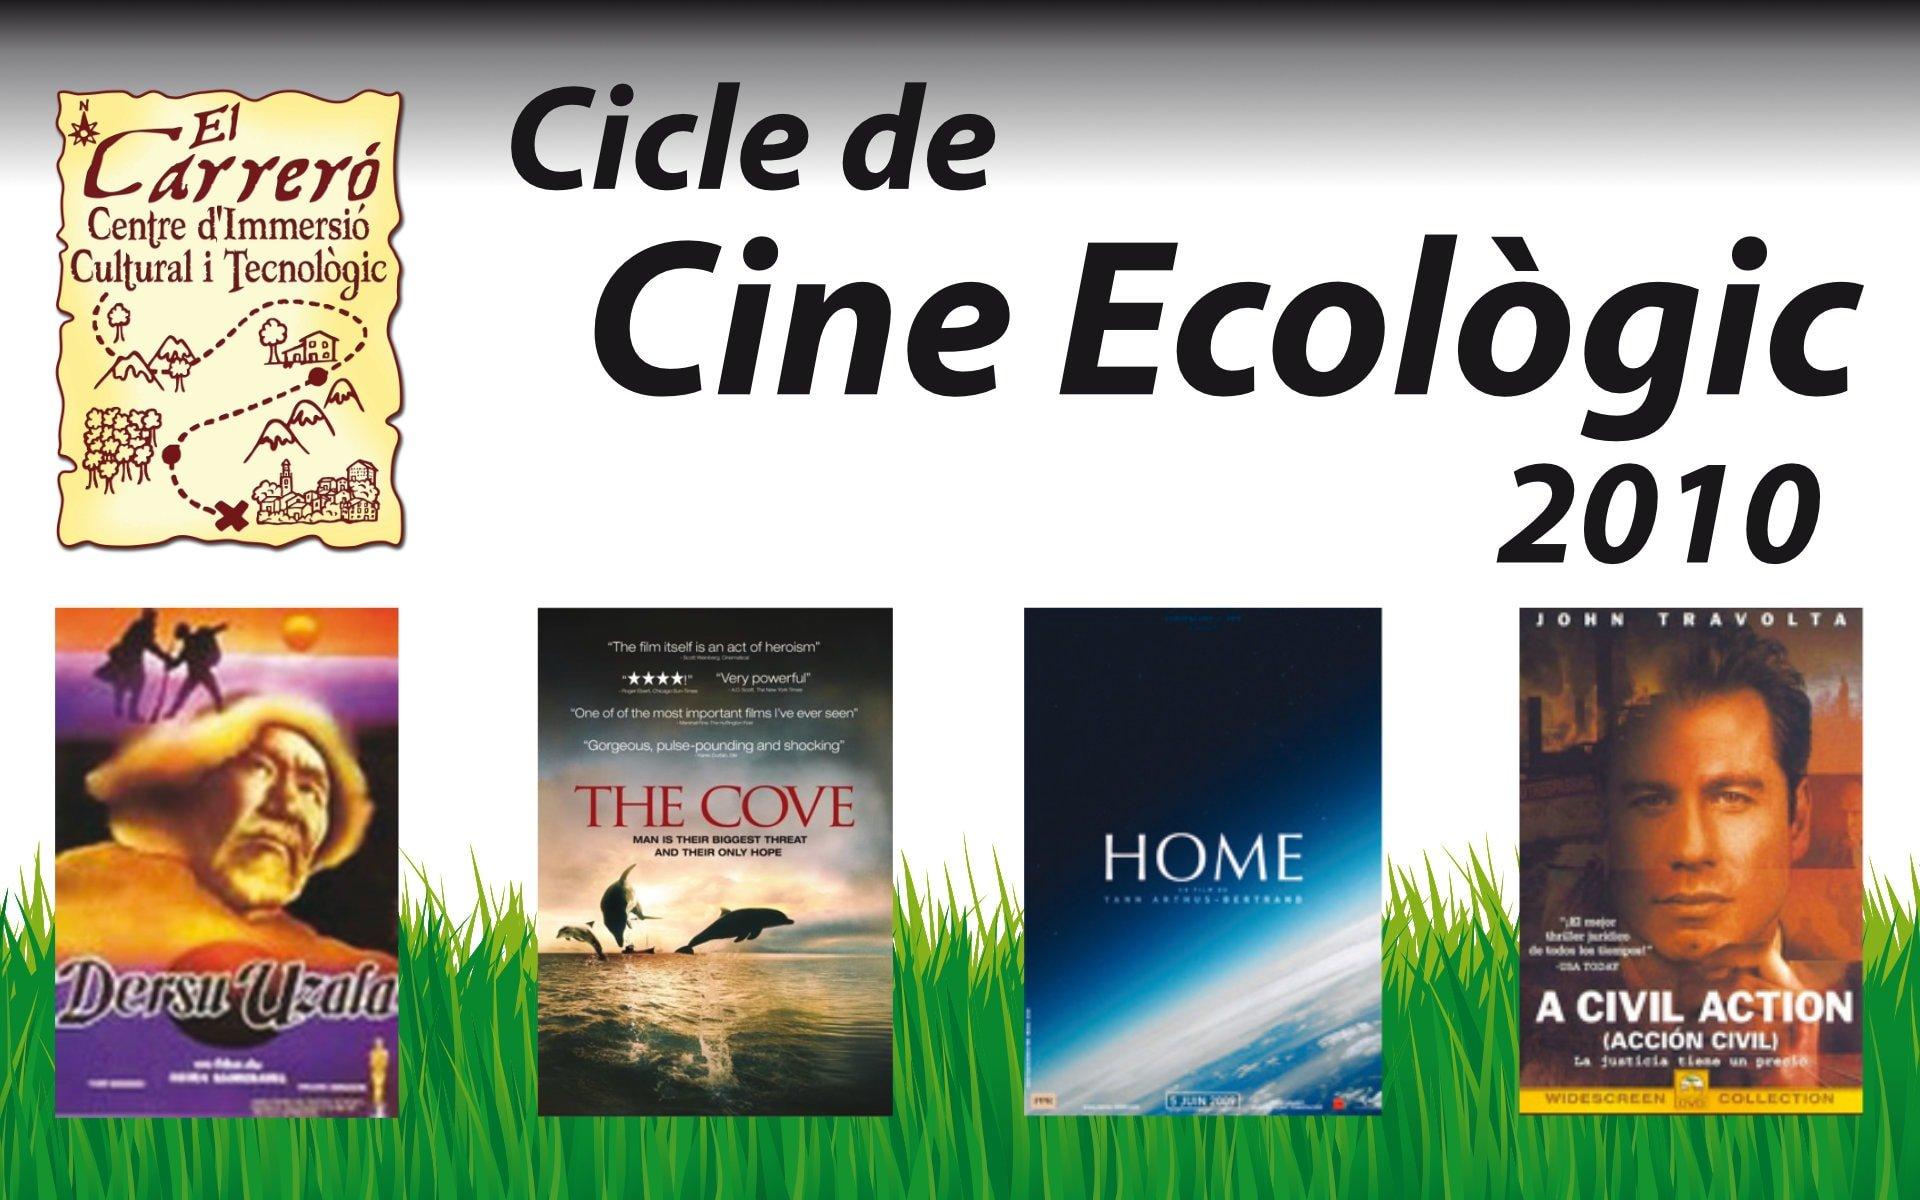 Cicle de Cine ecològic al Carreró